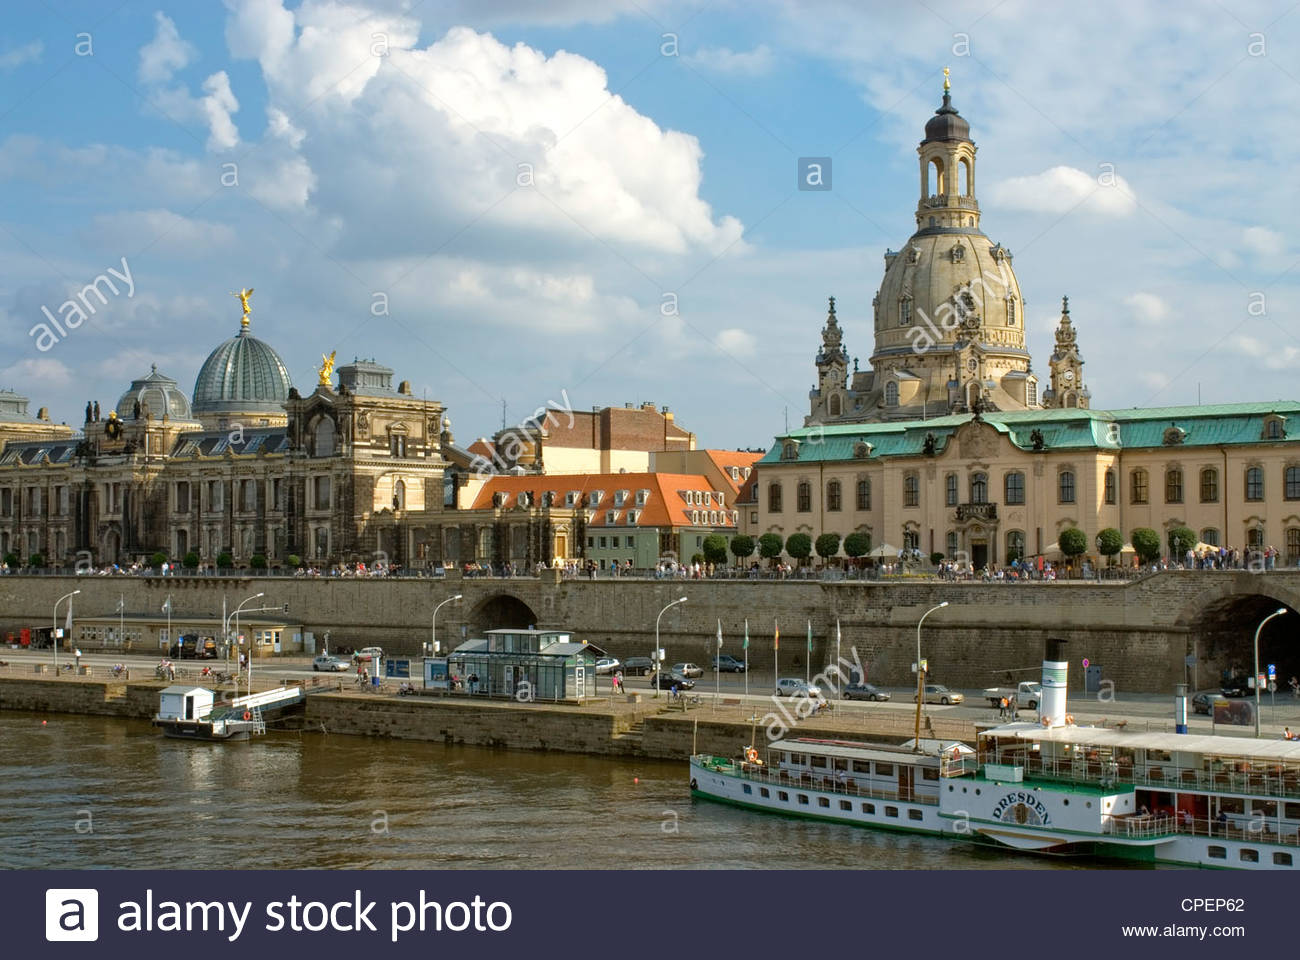 Bruhl S Terrace Dresden Germany Bruhlsche Terrasse Dresden